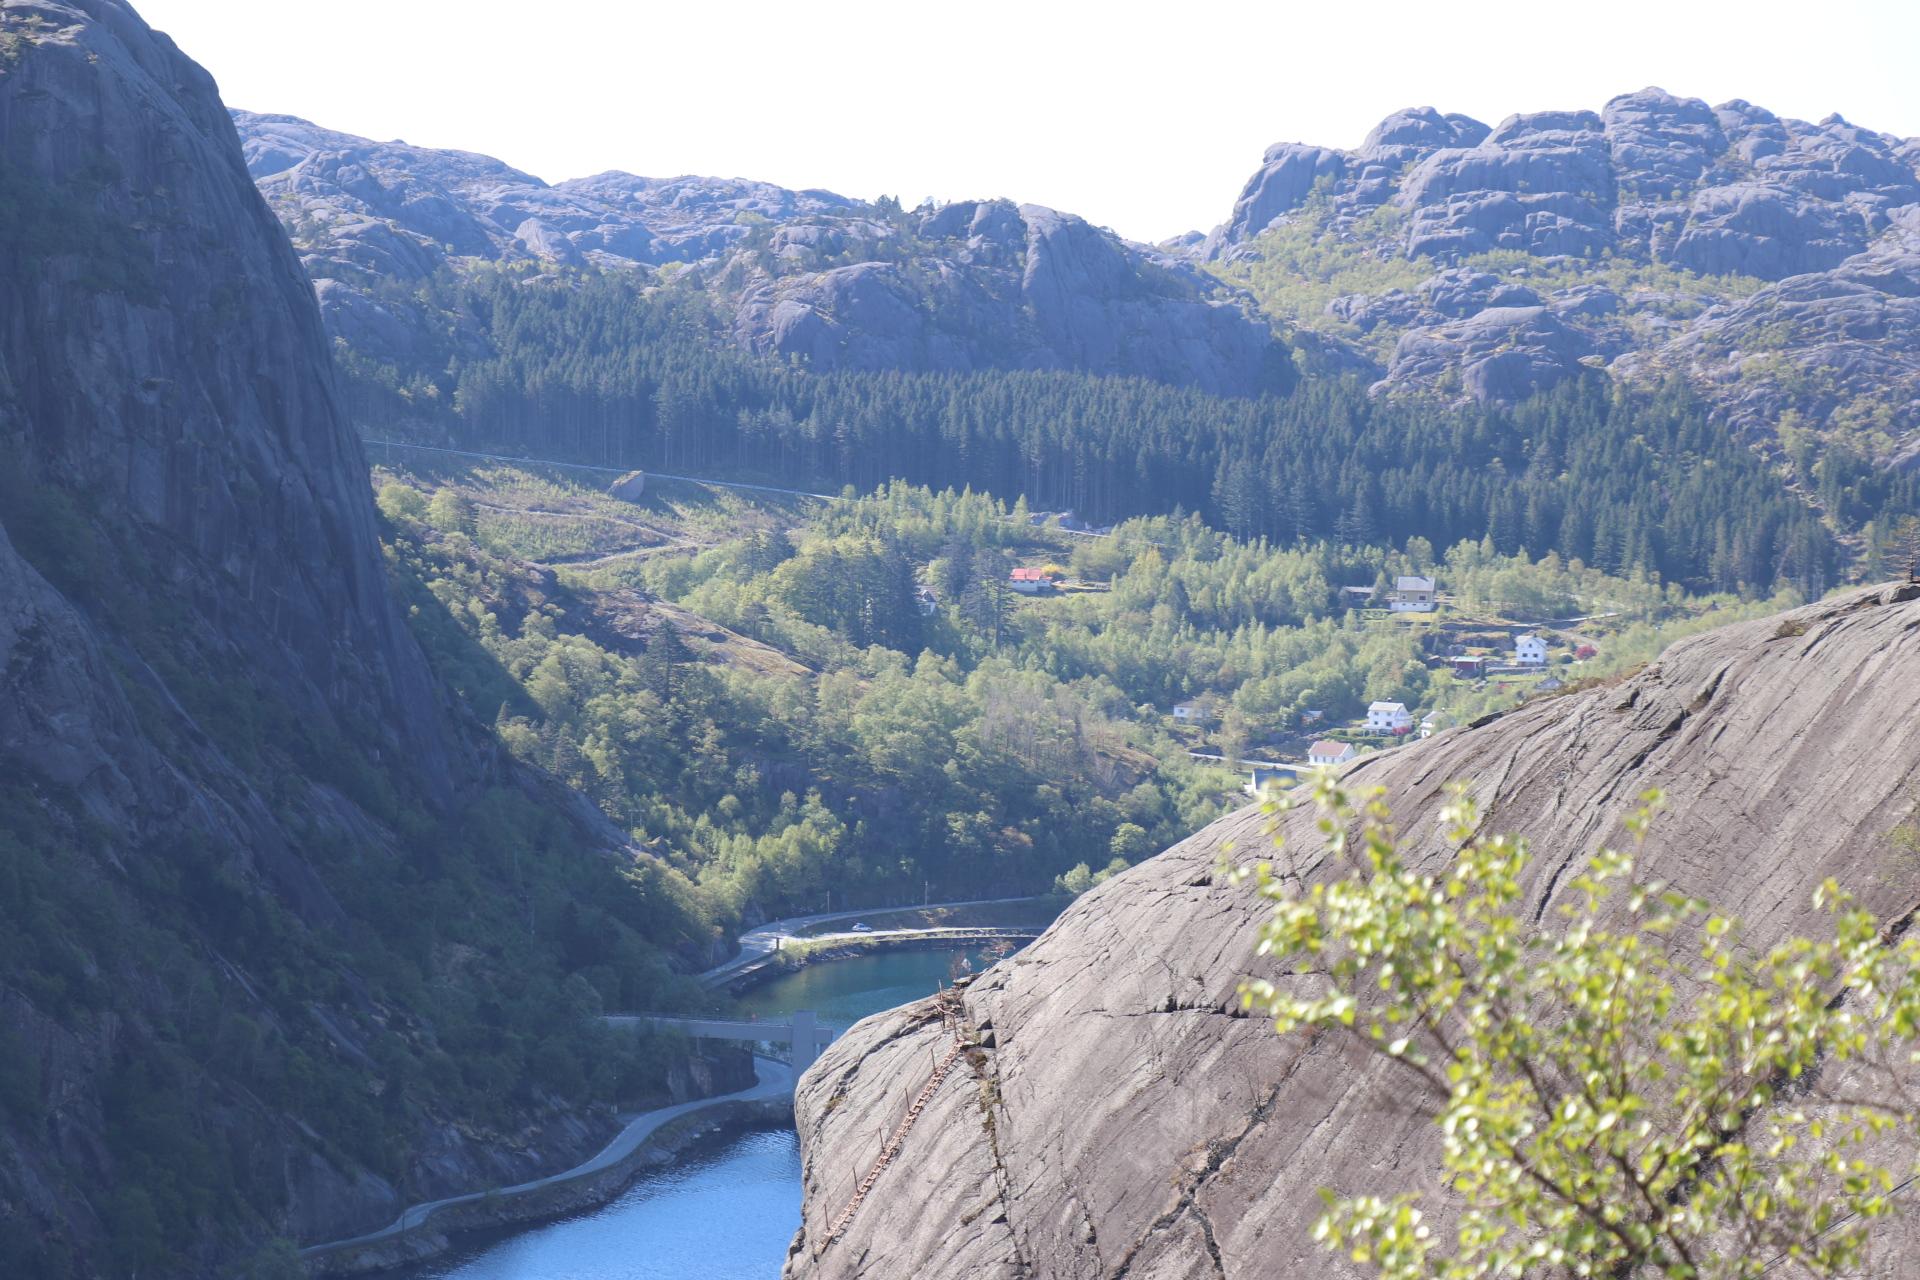 Zwischenstopp am Jøssingfjord vor Sokndal